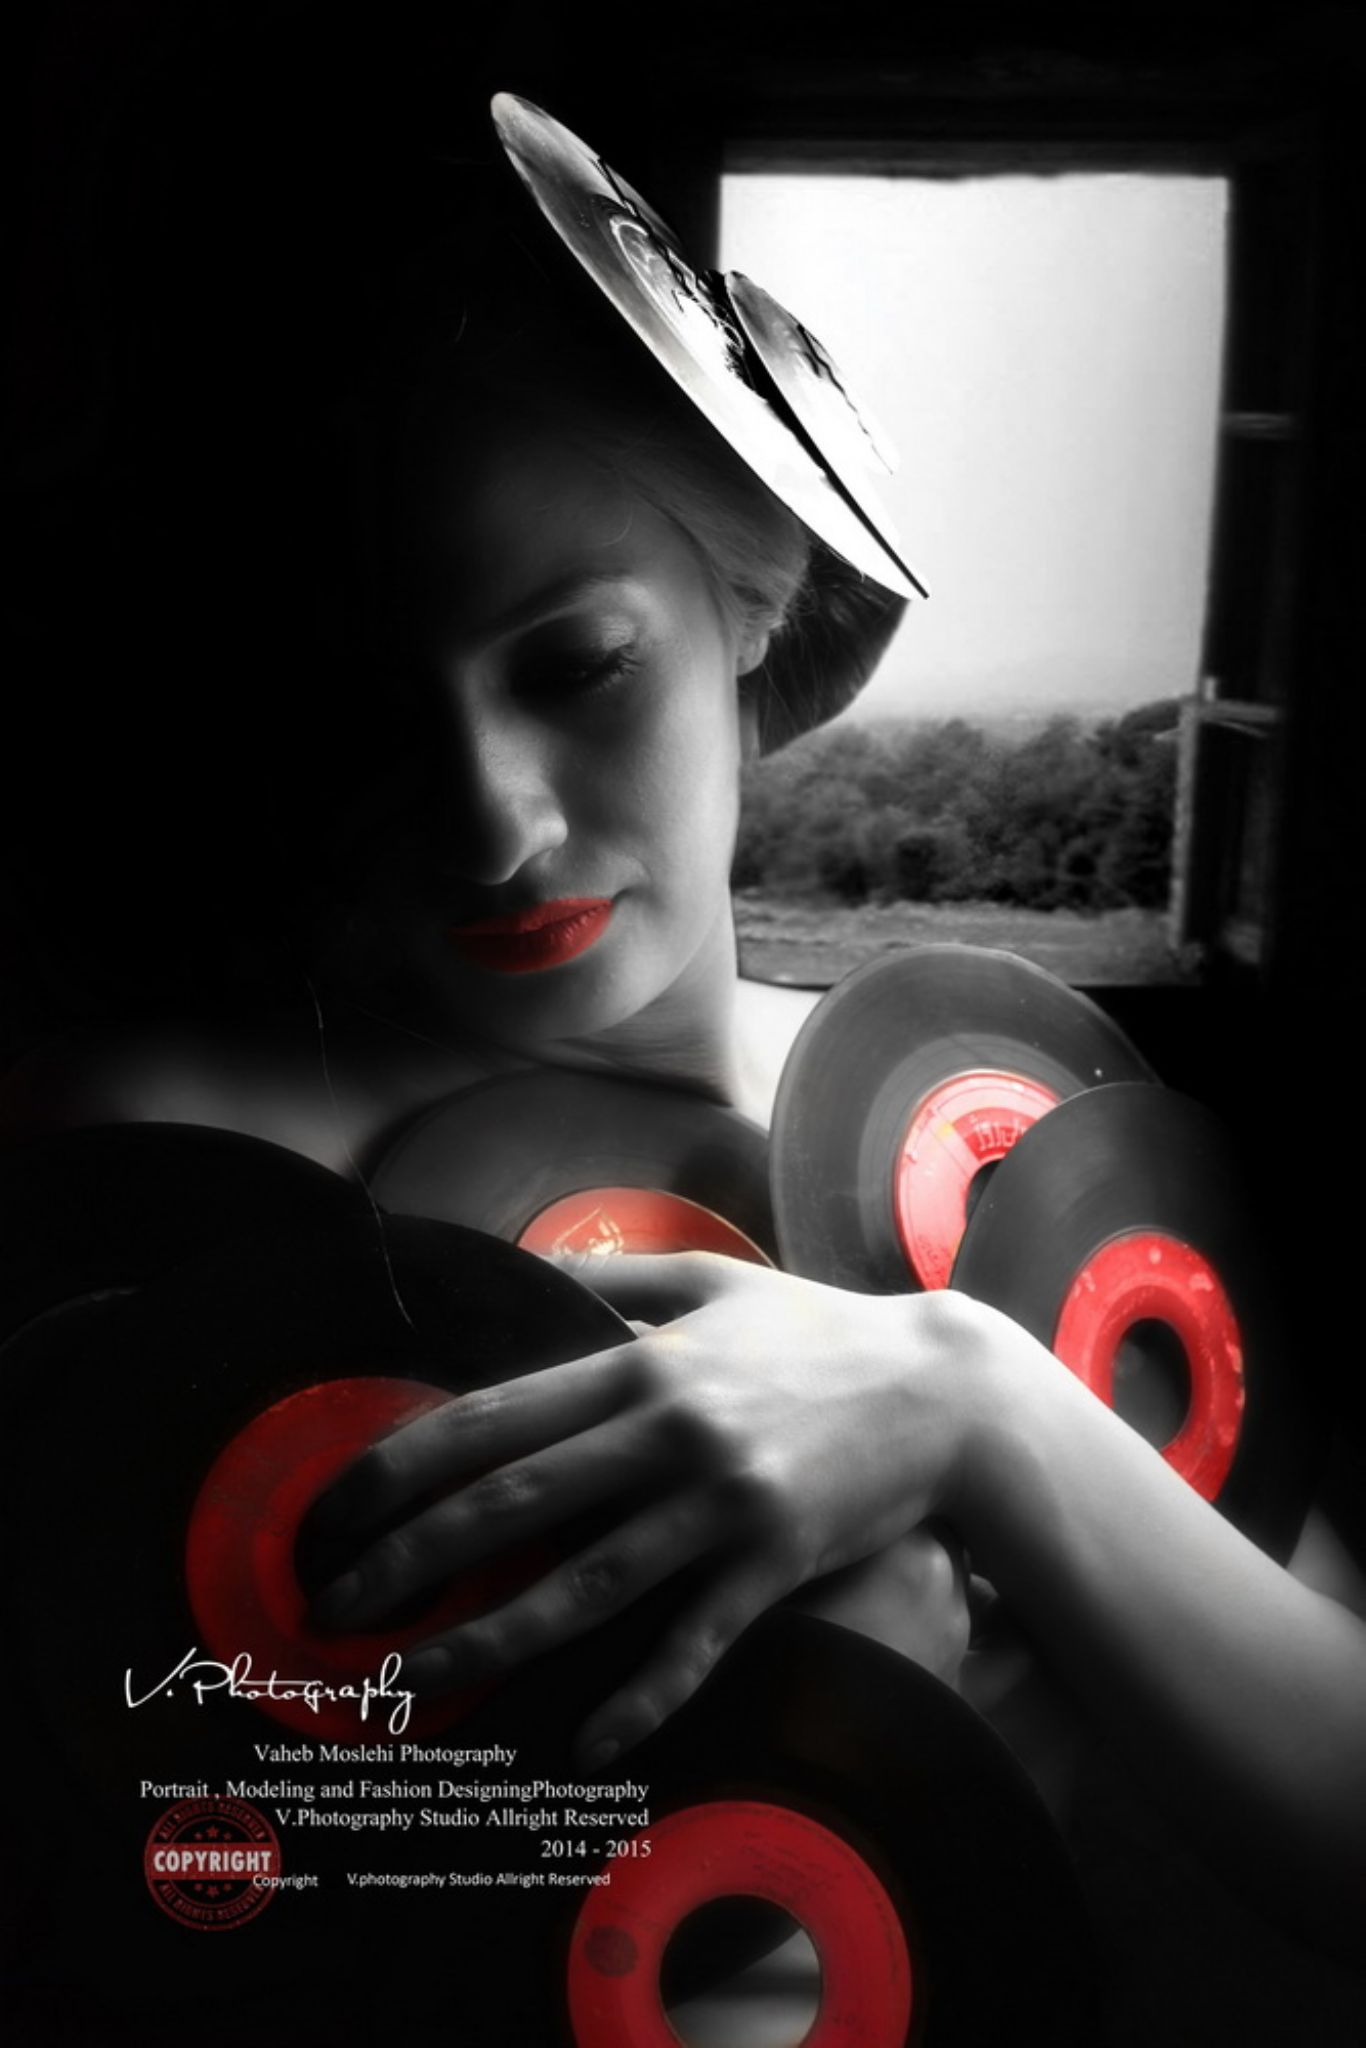 Red In the Dark by Vaaheb Moslehi Fard